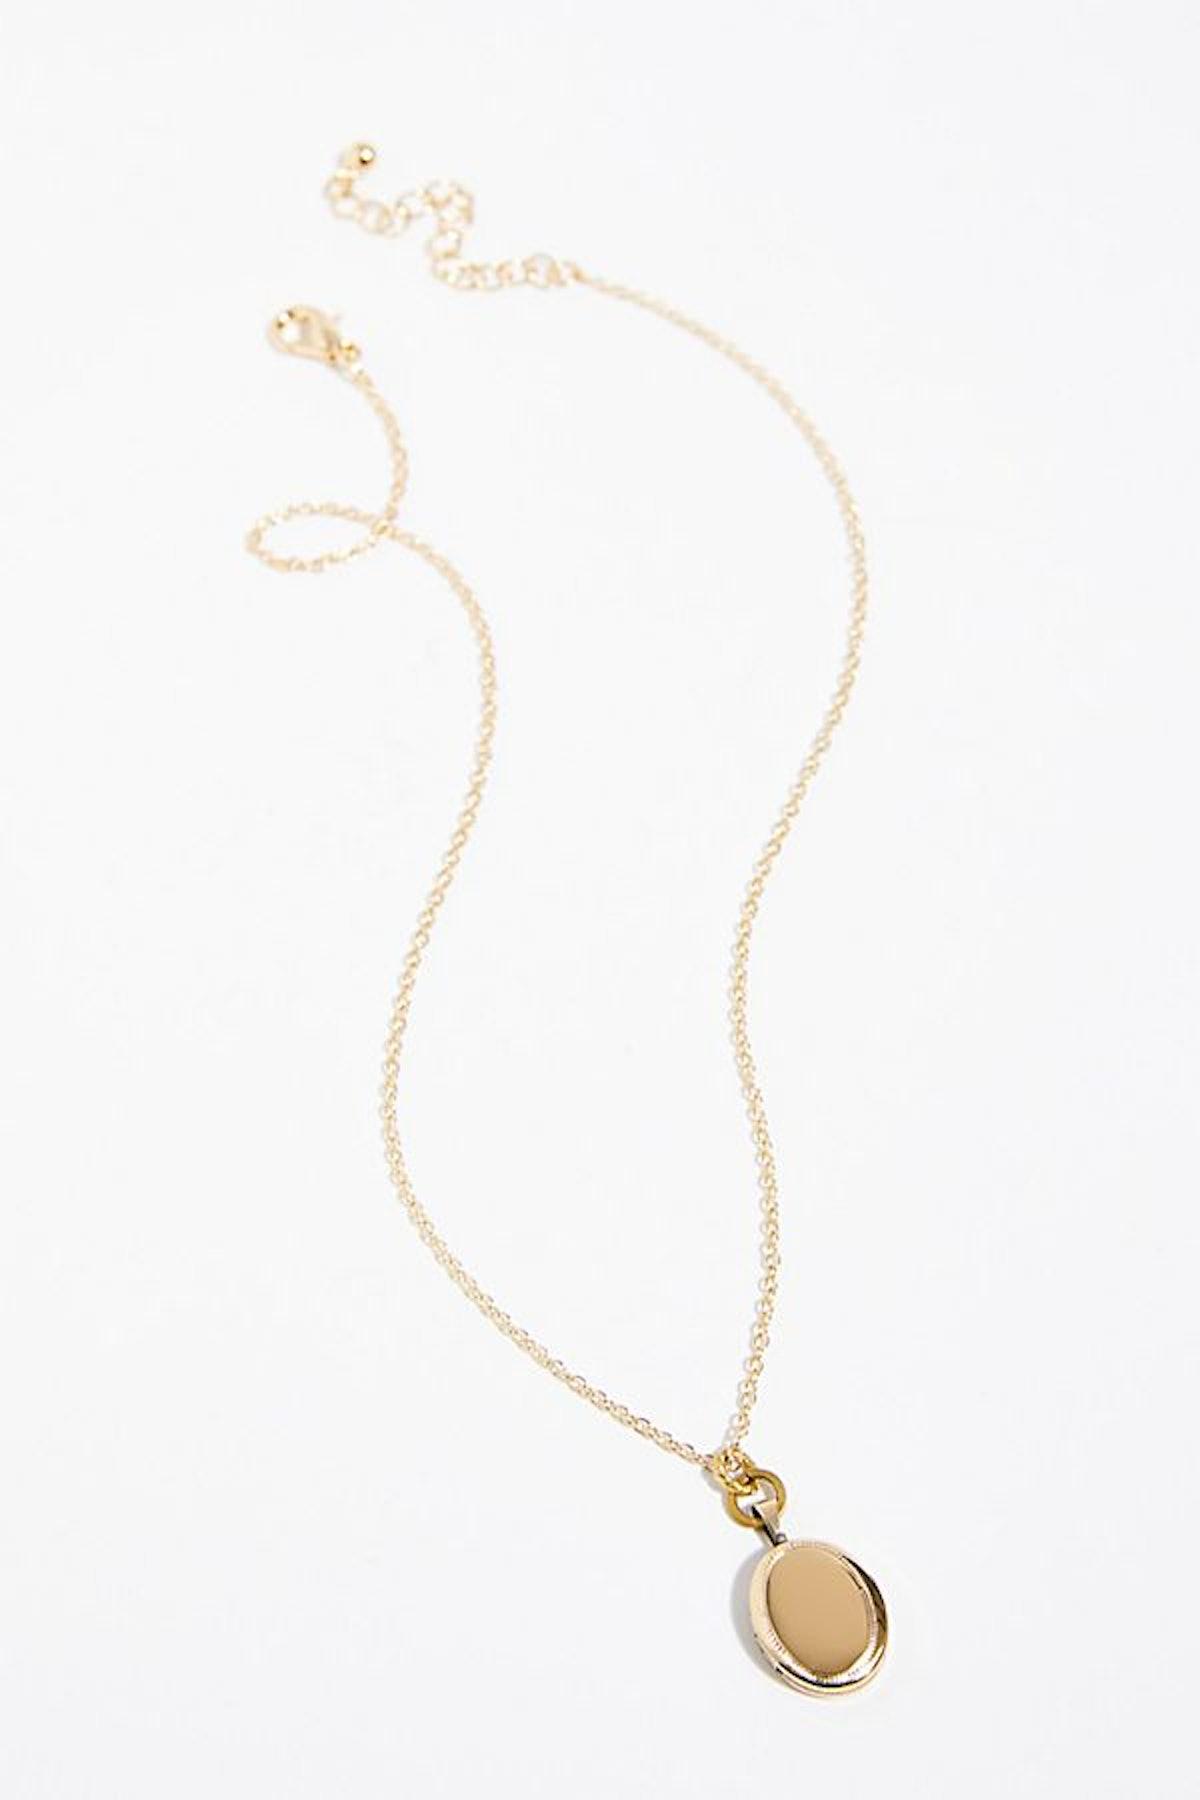 Scripted Locket Necklace